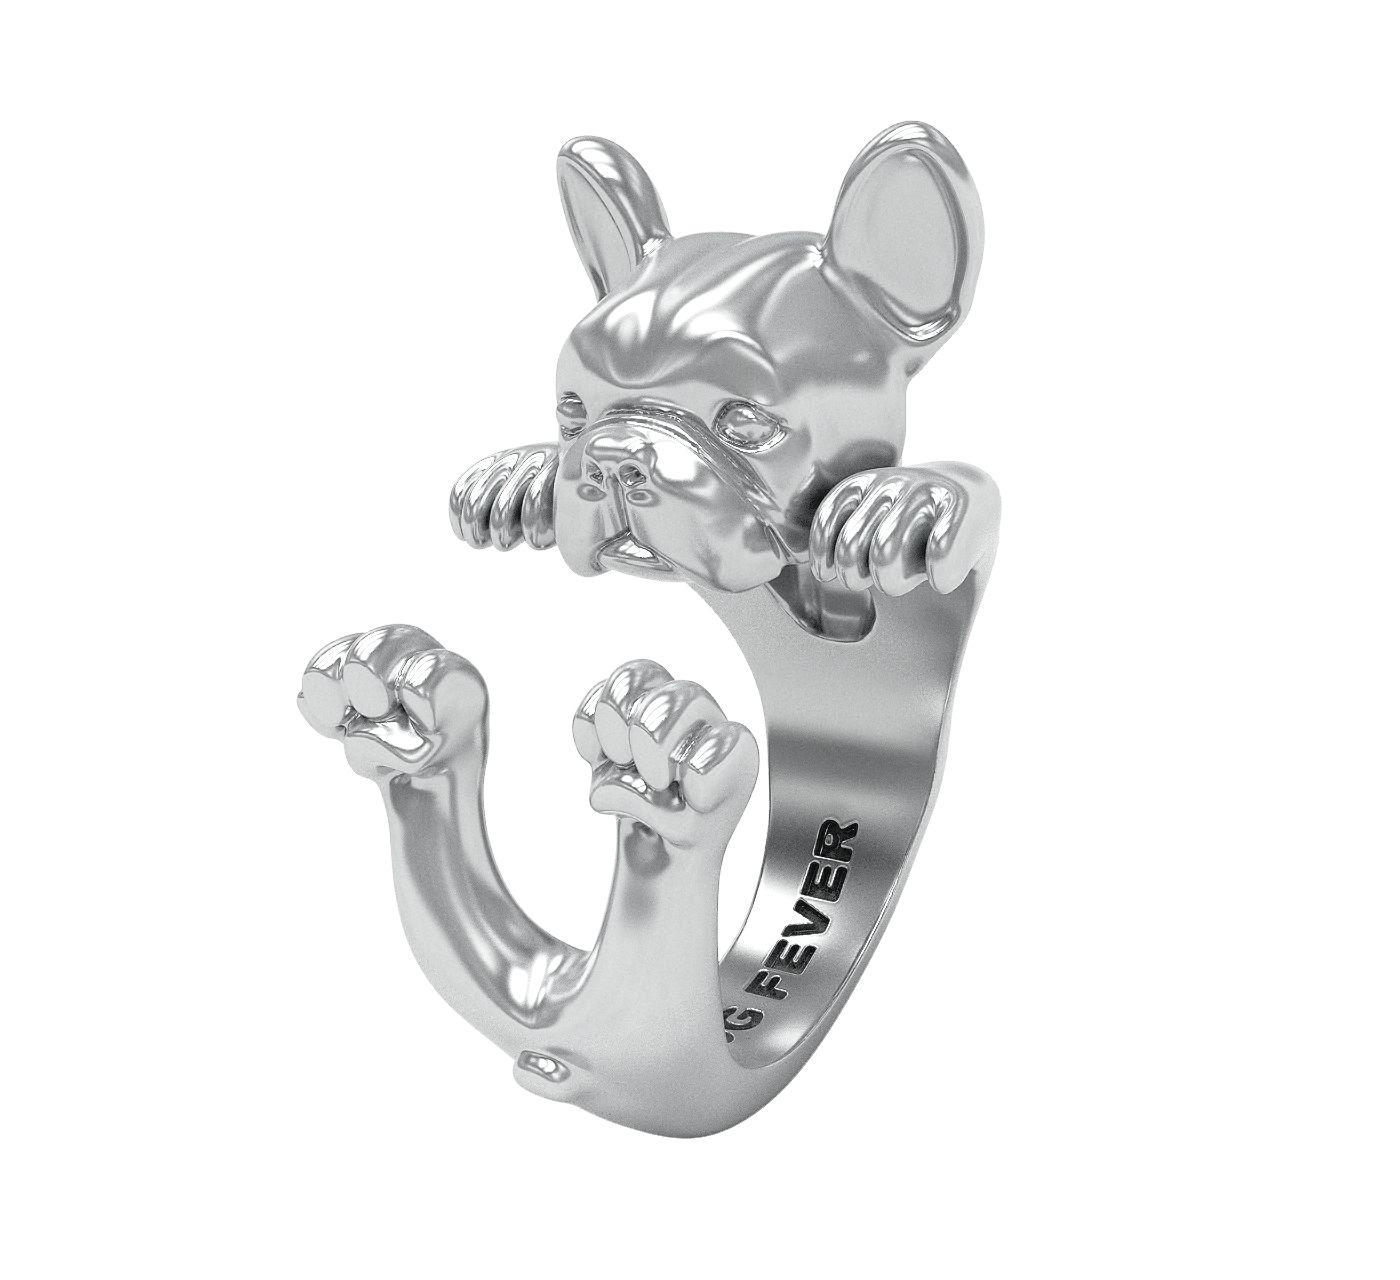 Pin By Melanie Reinke On Gift Ideas Blue Rings Dog Jewelry Jewelry